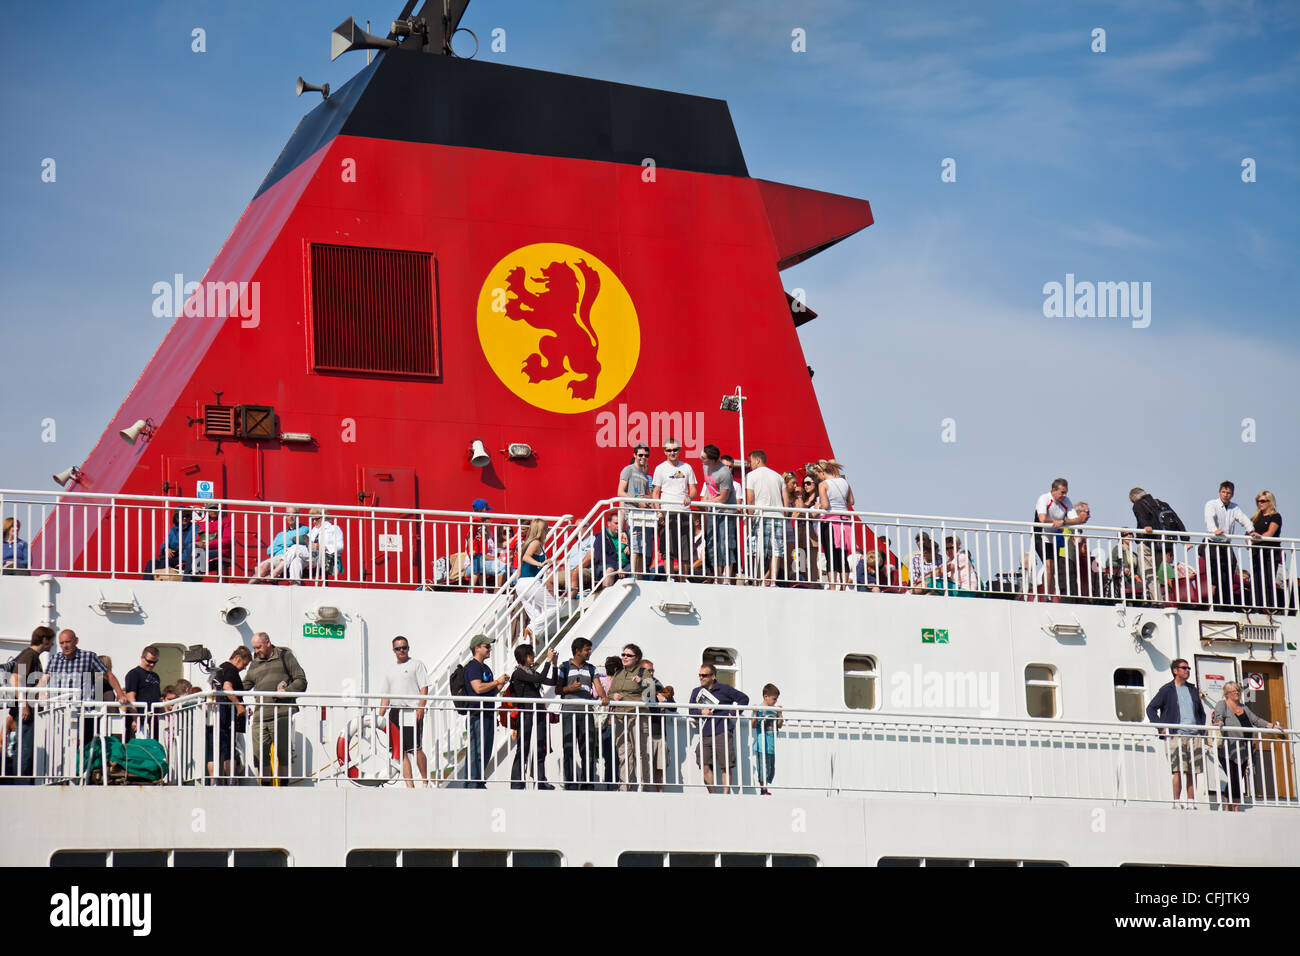 Passengers on board the Cal-Mac Arran ferry Caledonian Isles (Gaelic 'Eileanan Chaledonia') at Ardrossan. - Stock Image